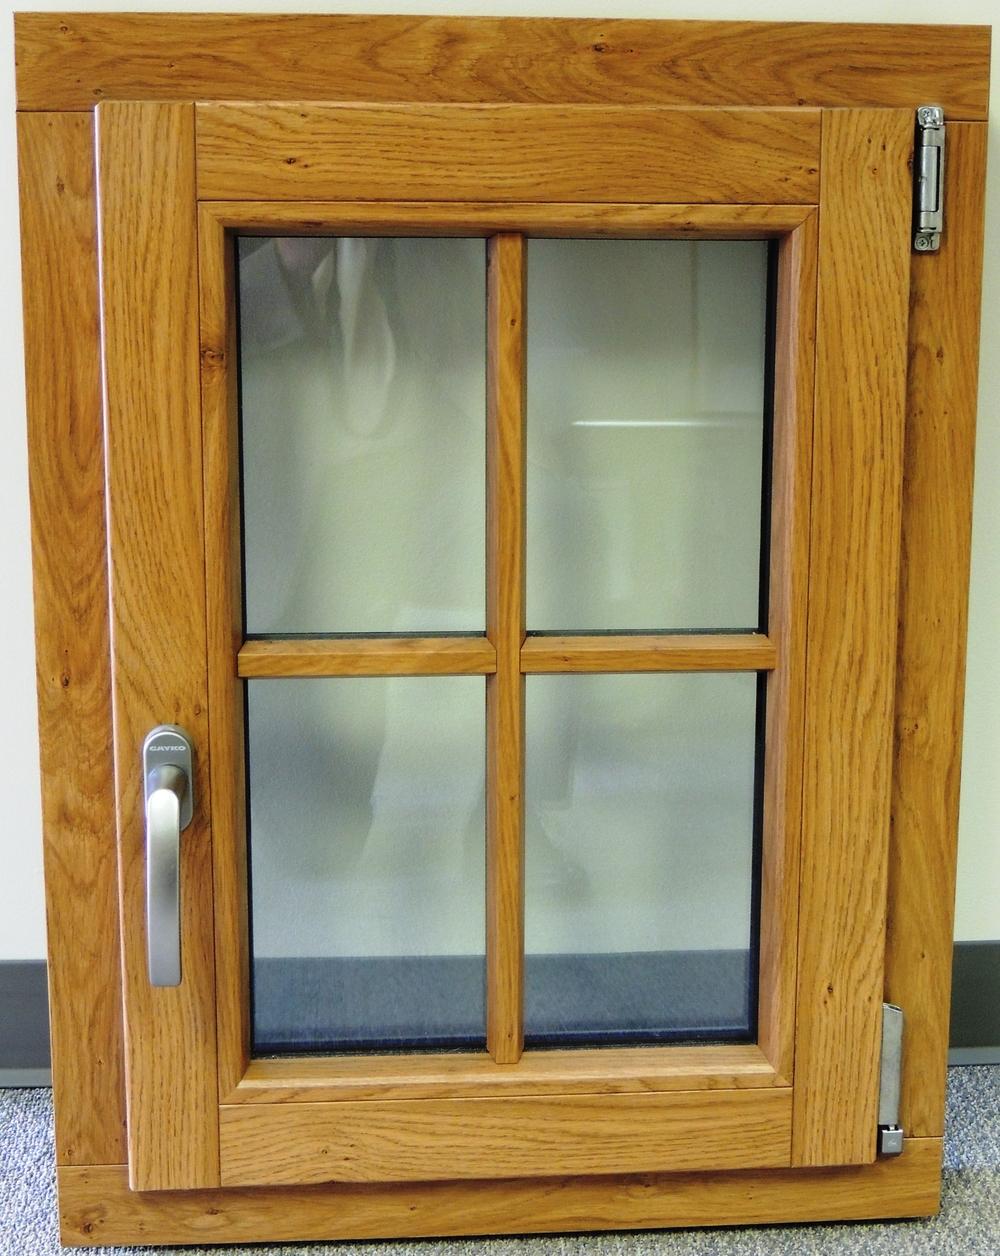 Upvc Windows That Look 100 Like Wood Henselstone Window